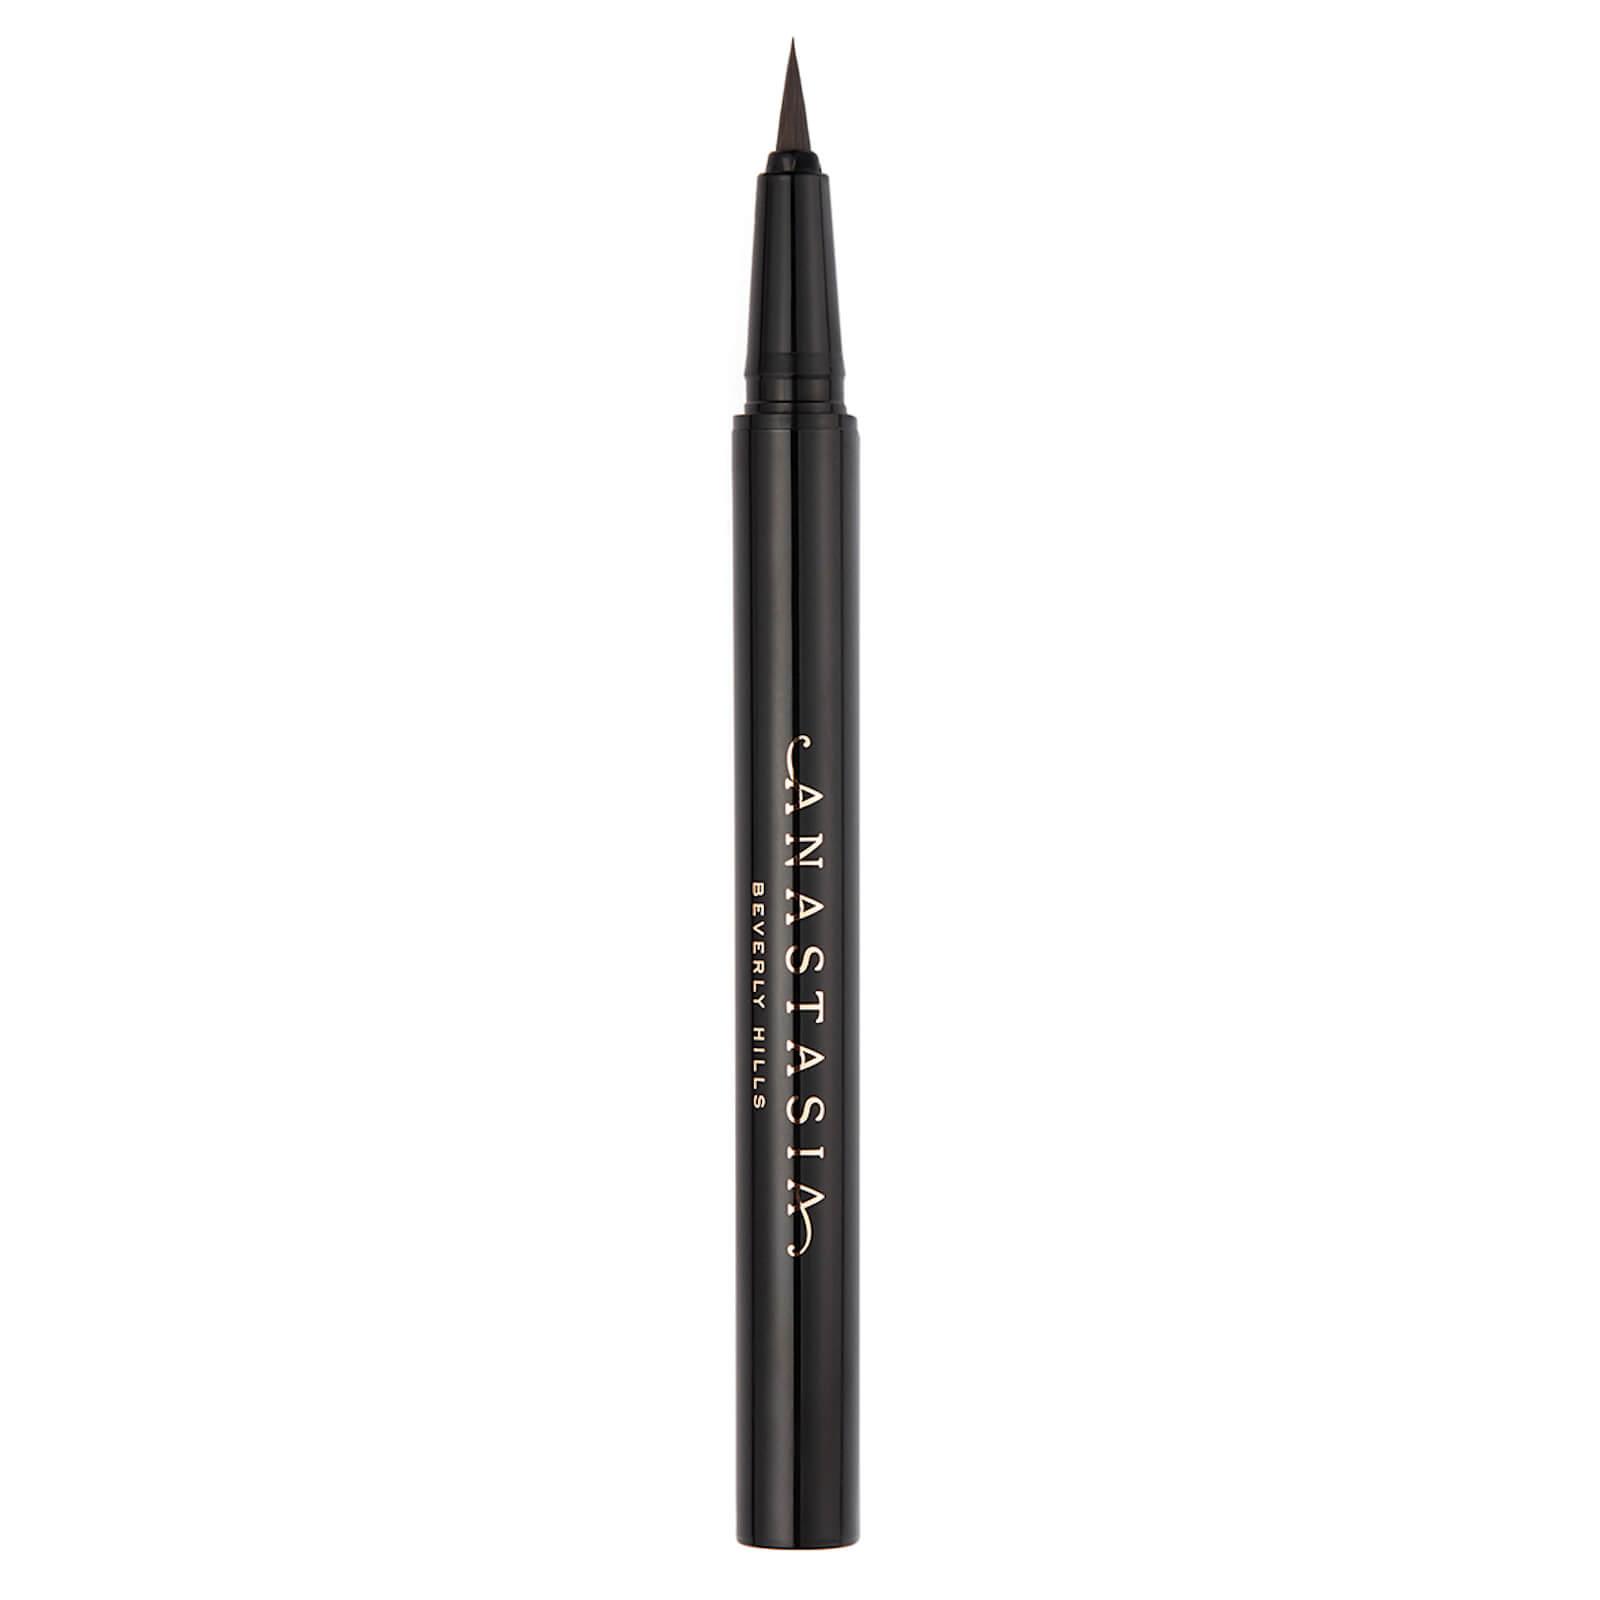 Купить Anastasia Beverly Hills Brow Pen 0.5ml (Various Shades) - Caramel